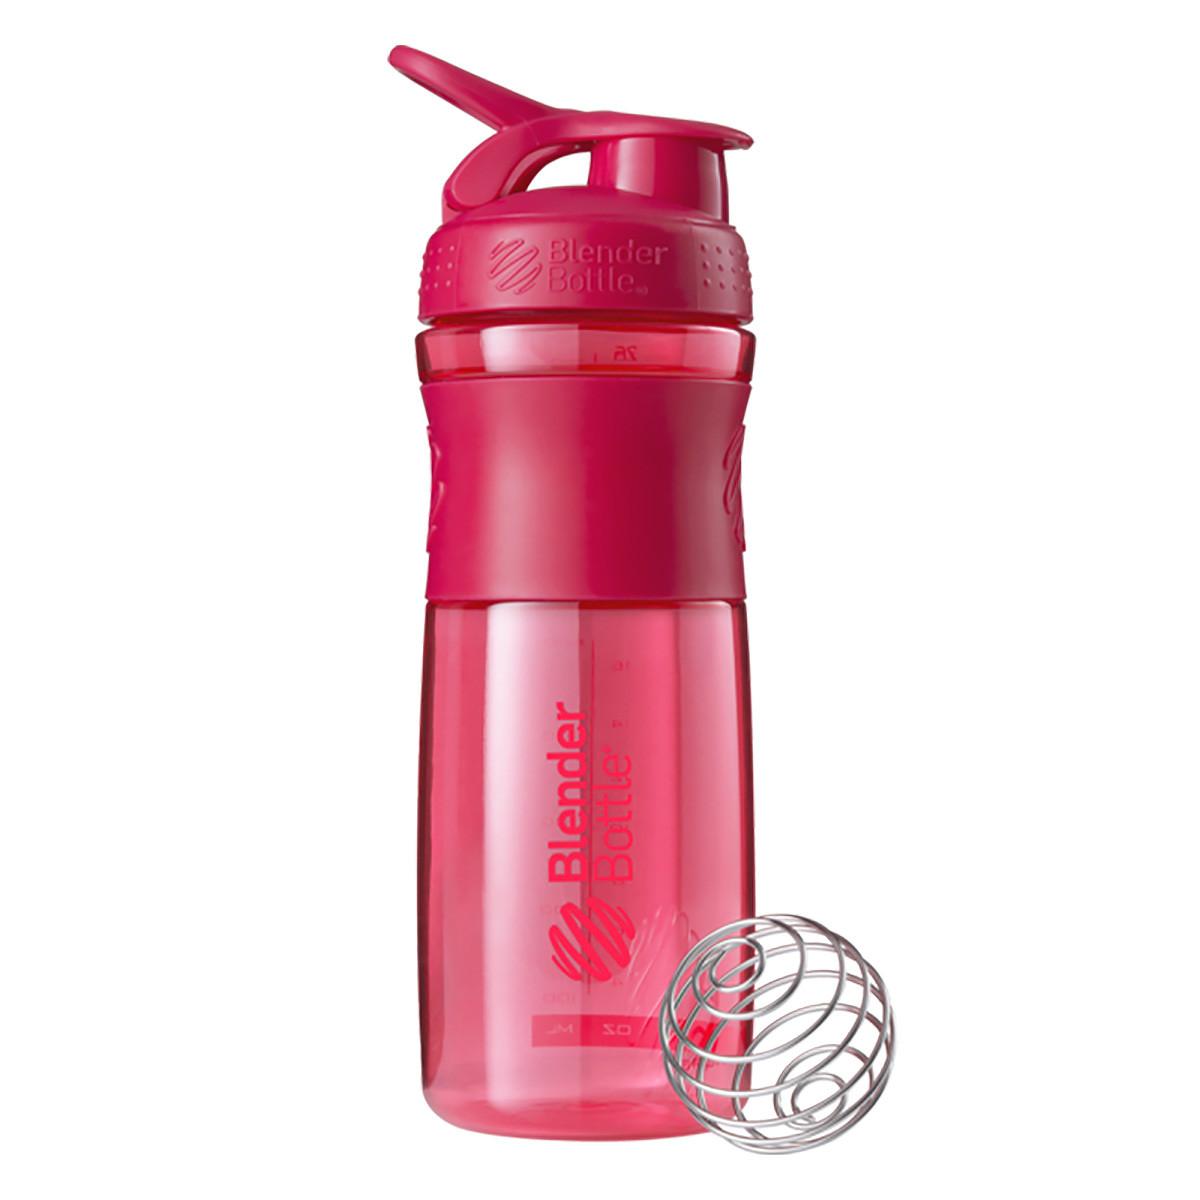 Blender Bottle 运动水壶摇摇杯蛋白粉杯户外杯健身杯运动水杯28